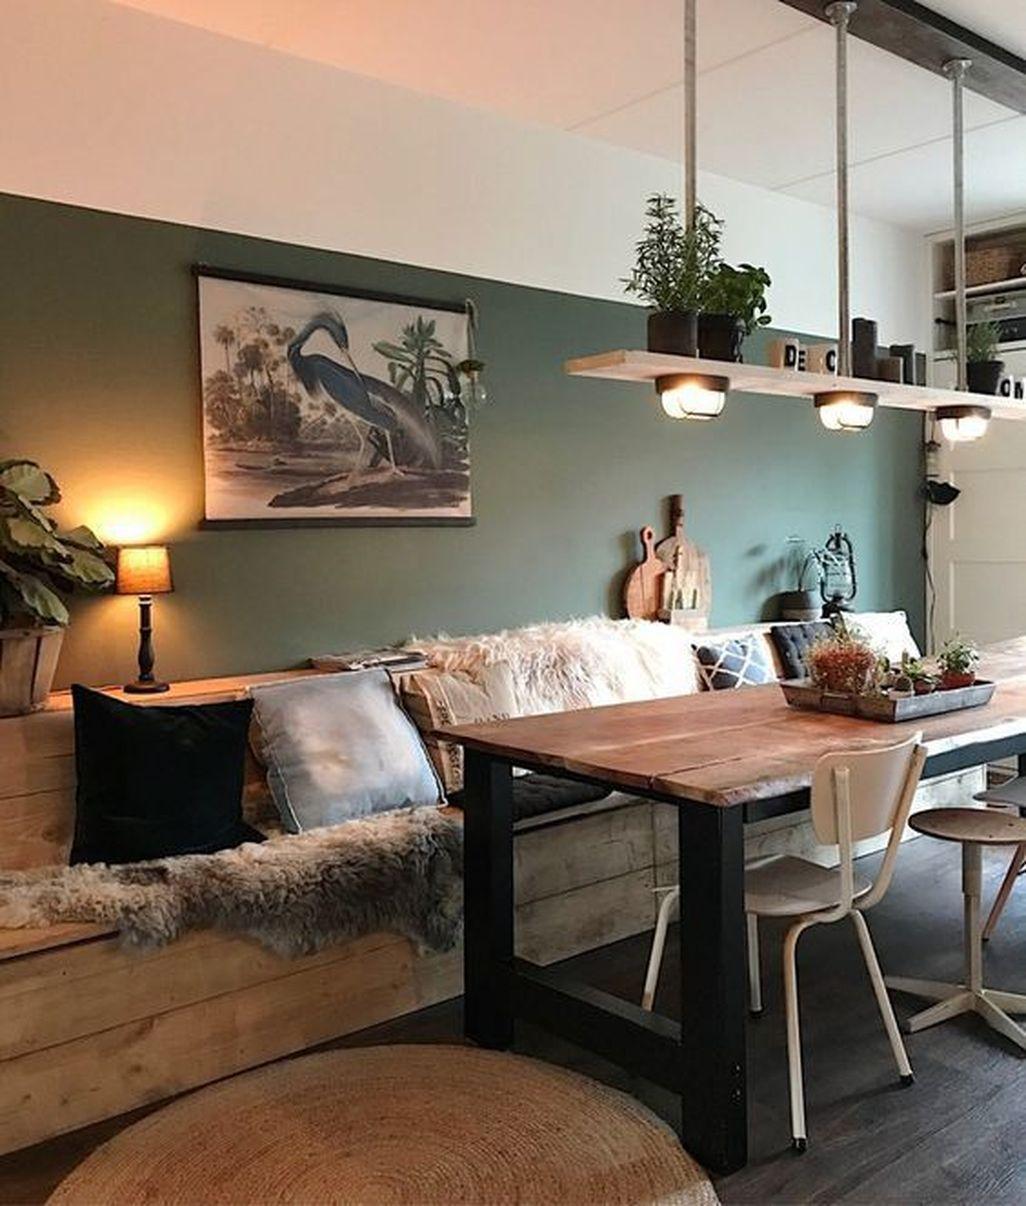 43 inspiring rustic wooden decor ideas interior design pinterest rh pinterest com